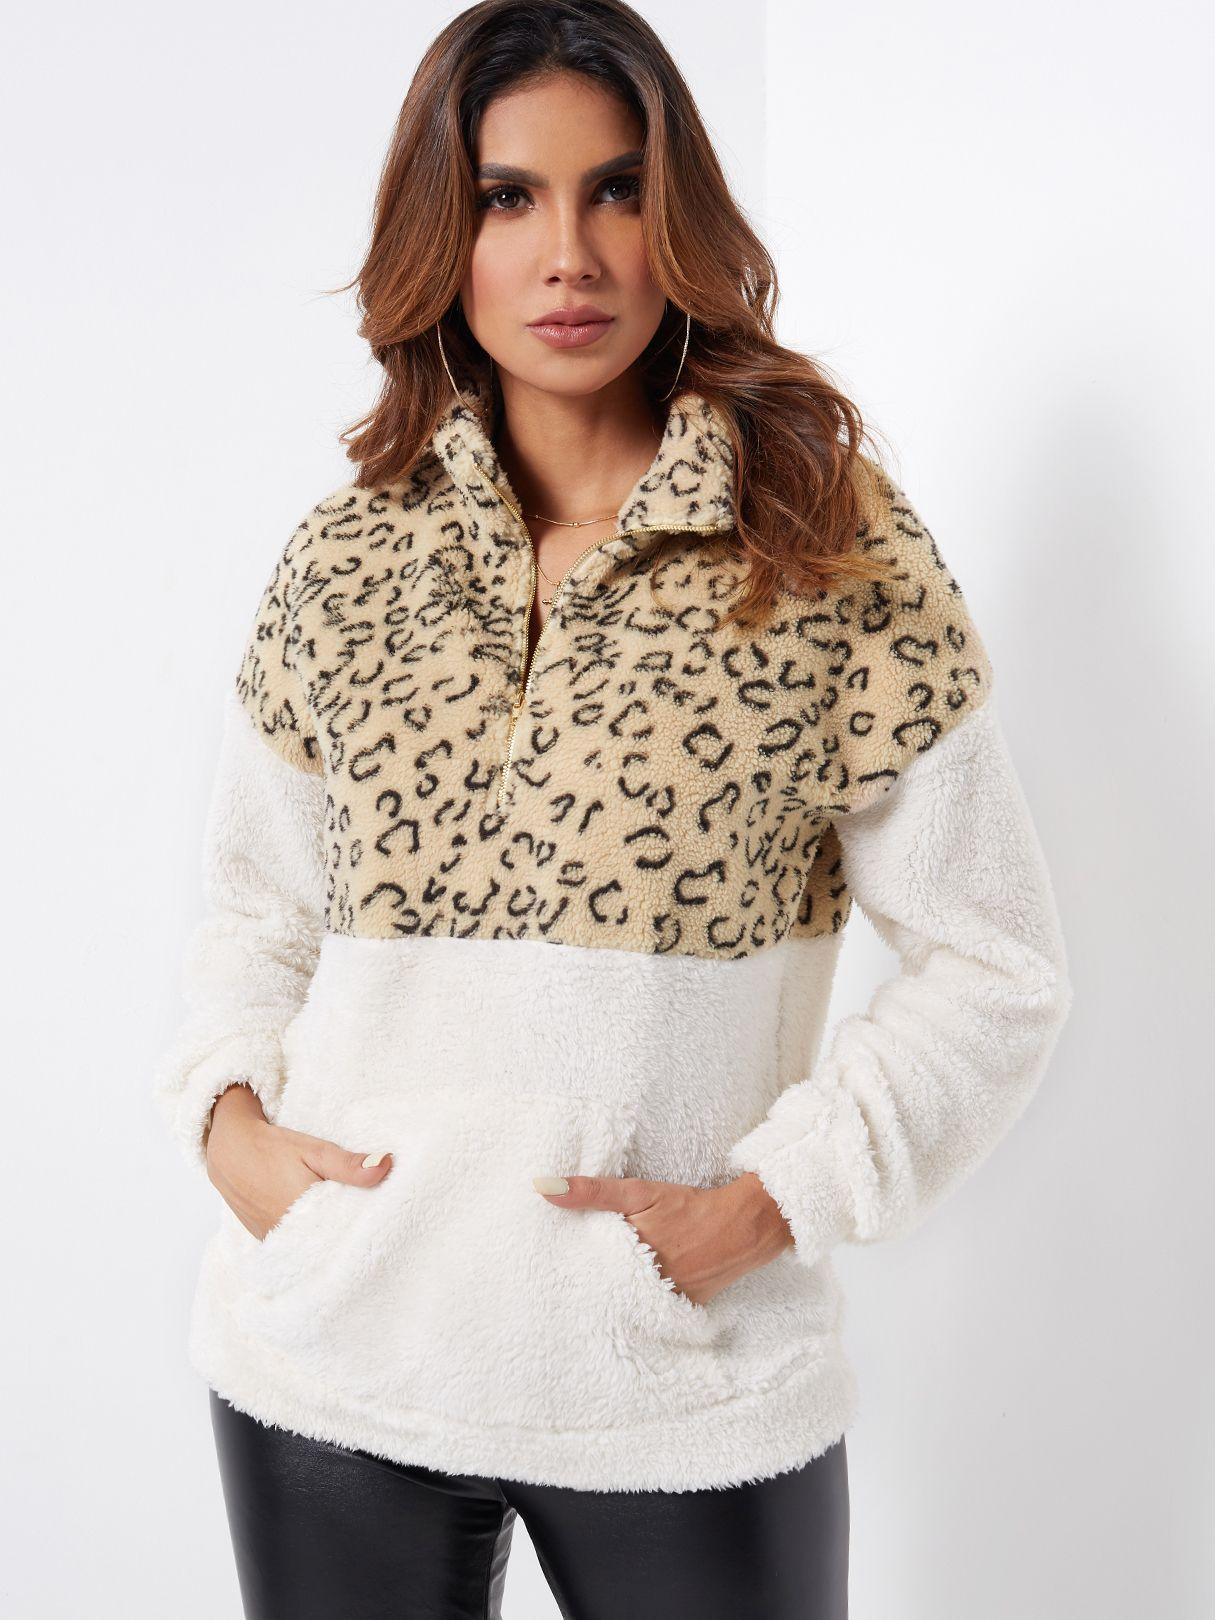 Color Block Zipper Front Leopard Chimney Collar Long Sleeves Fluffy Sweatshirts Color Block Zipper Front Leopard Chimney Collar Long Sleeves Fluffy Sweatshirts,